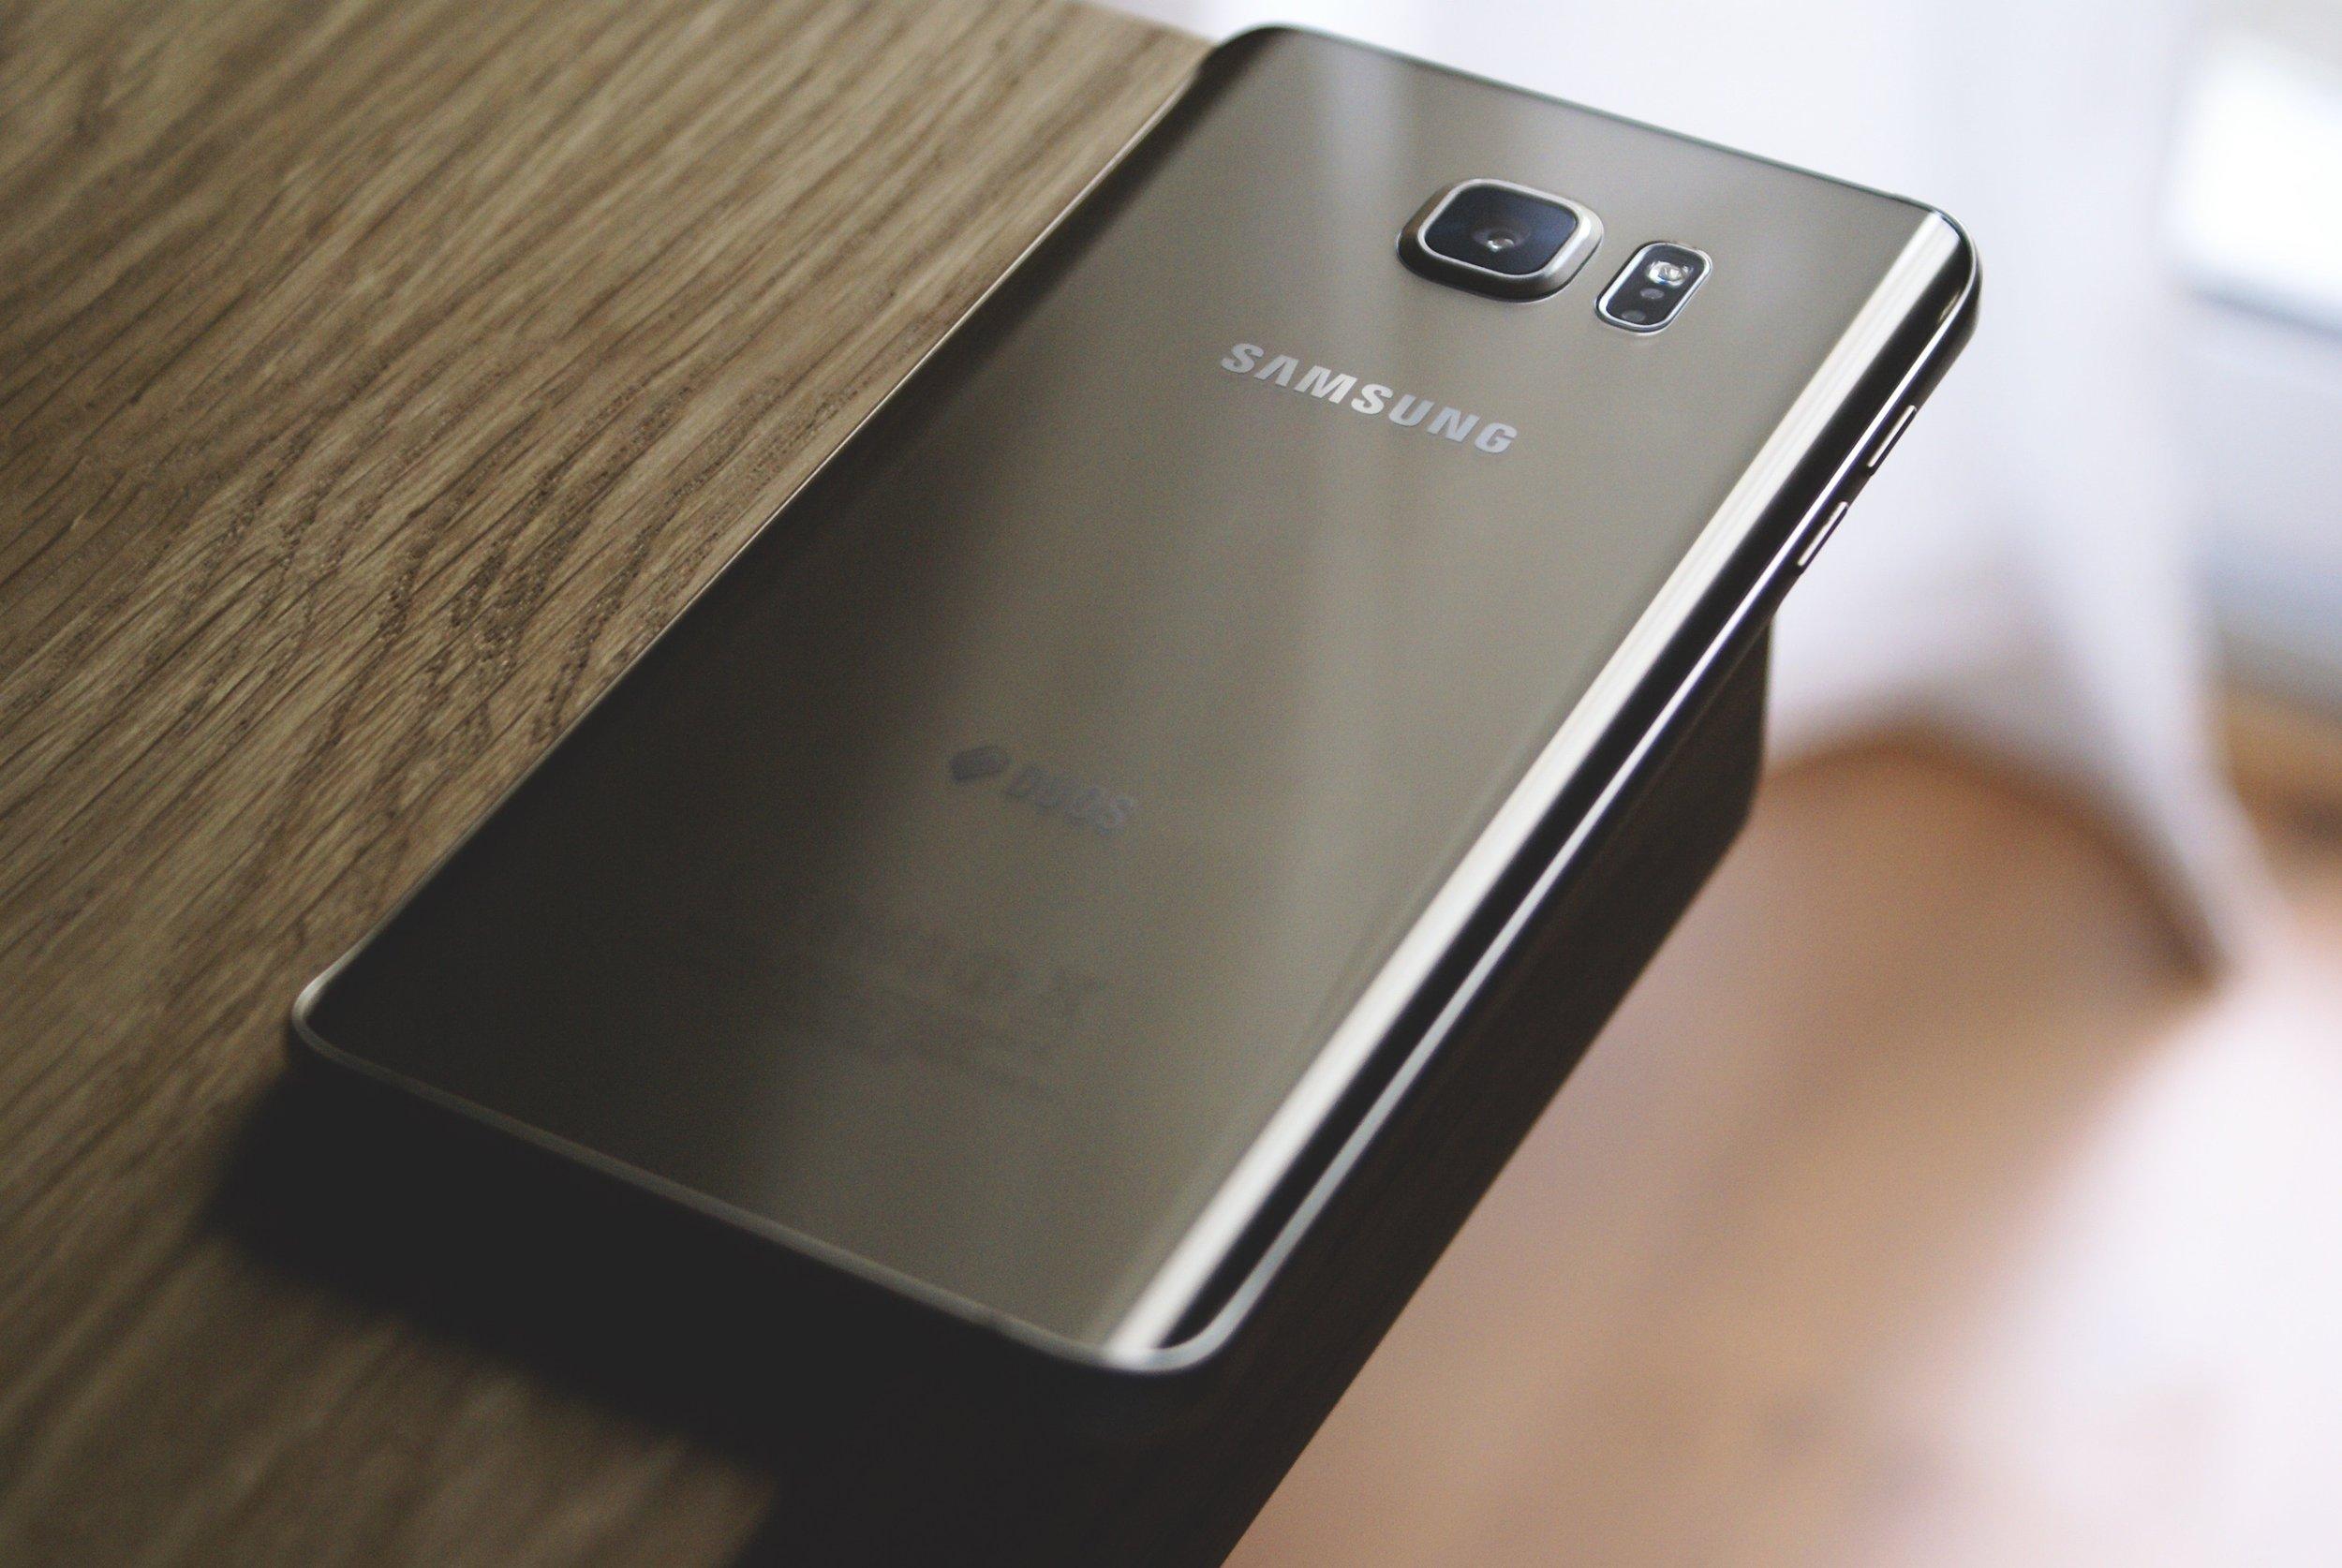 electronics-gadget-mobile-phone-214488.jpg